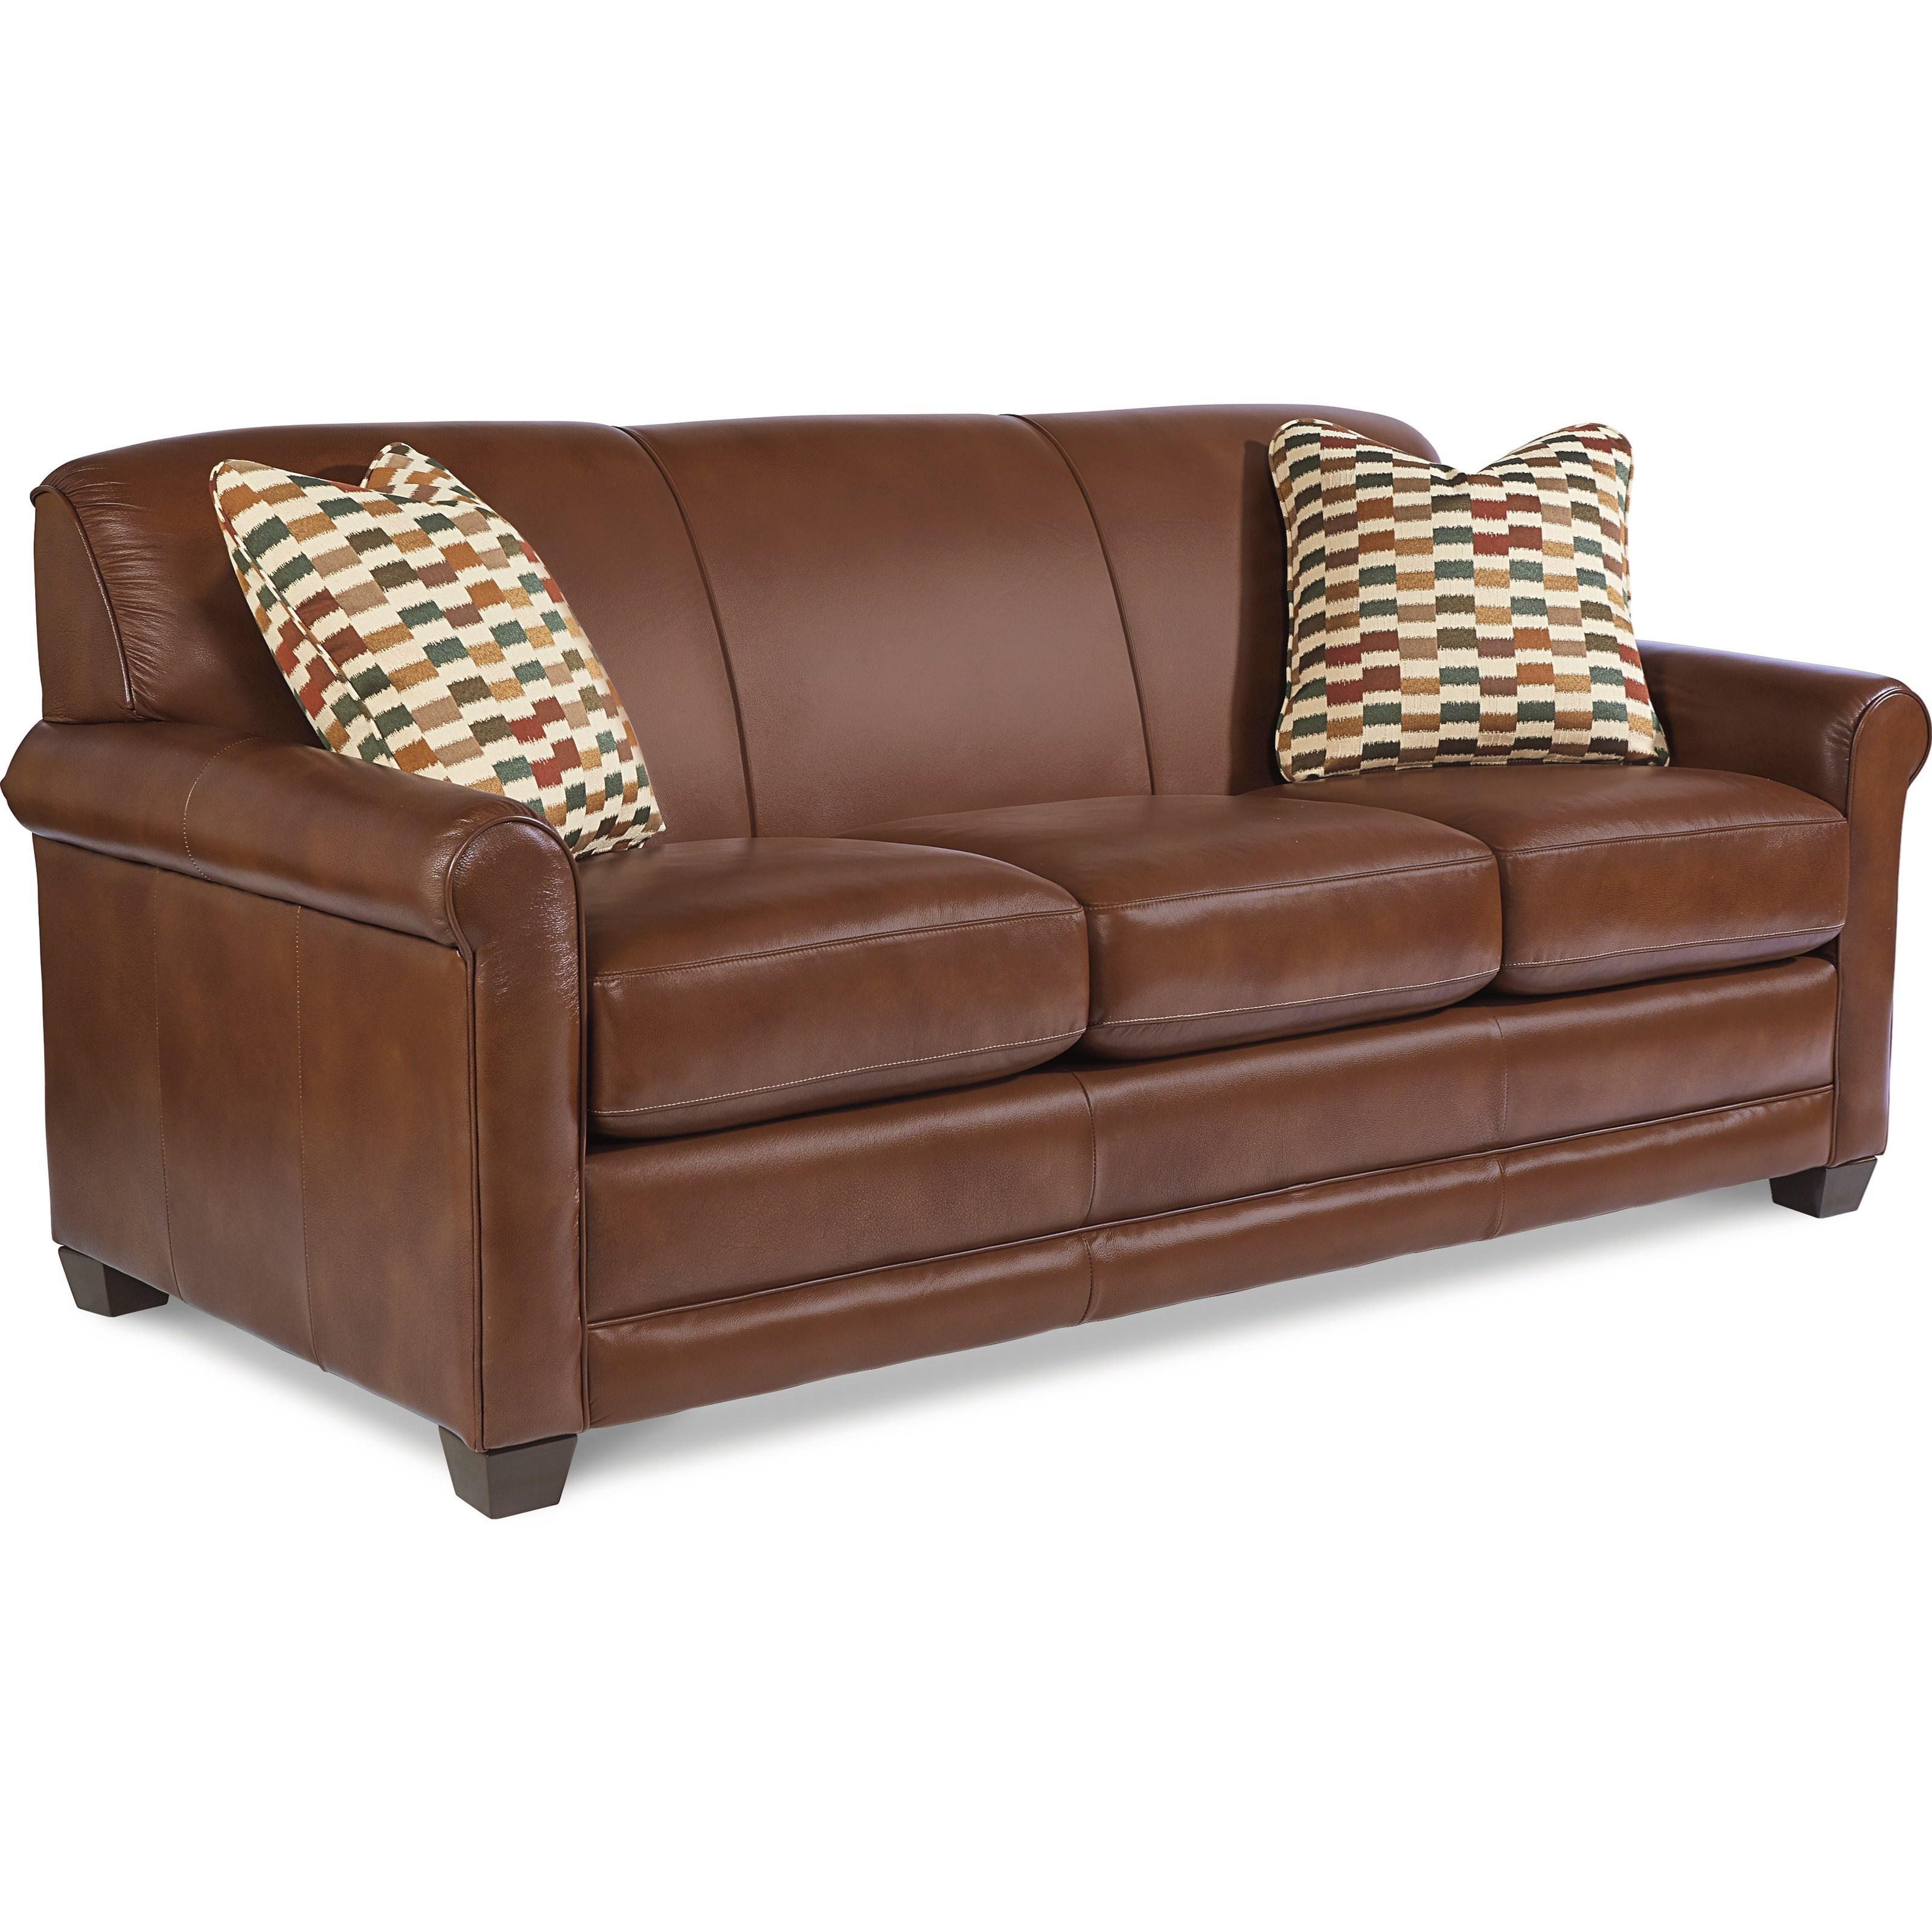 La Z Boy Amanda Casual Sleeper Sofa with Premier ...